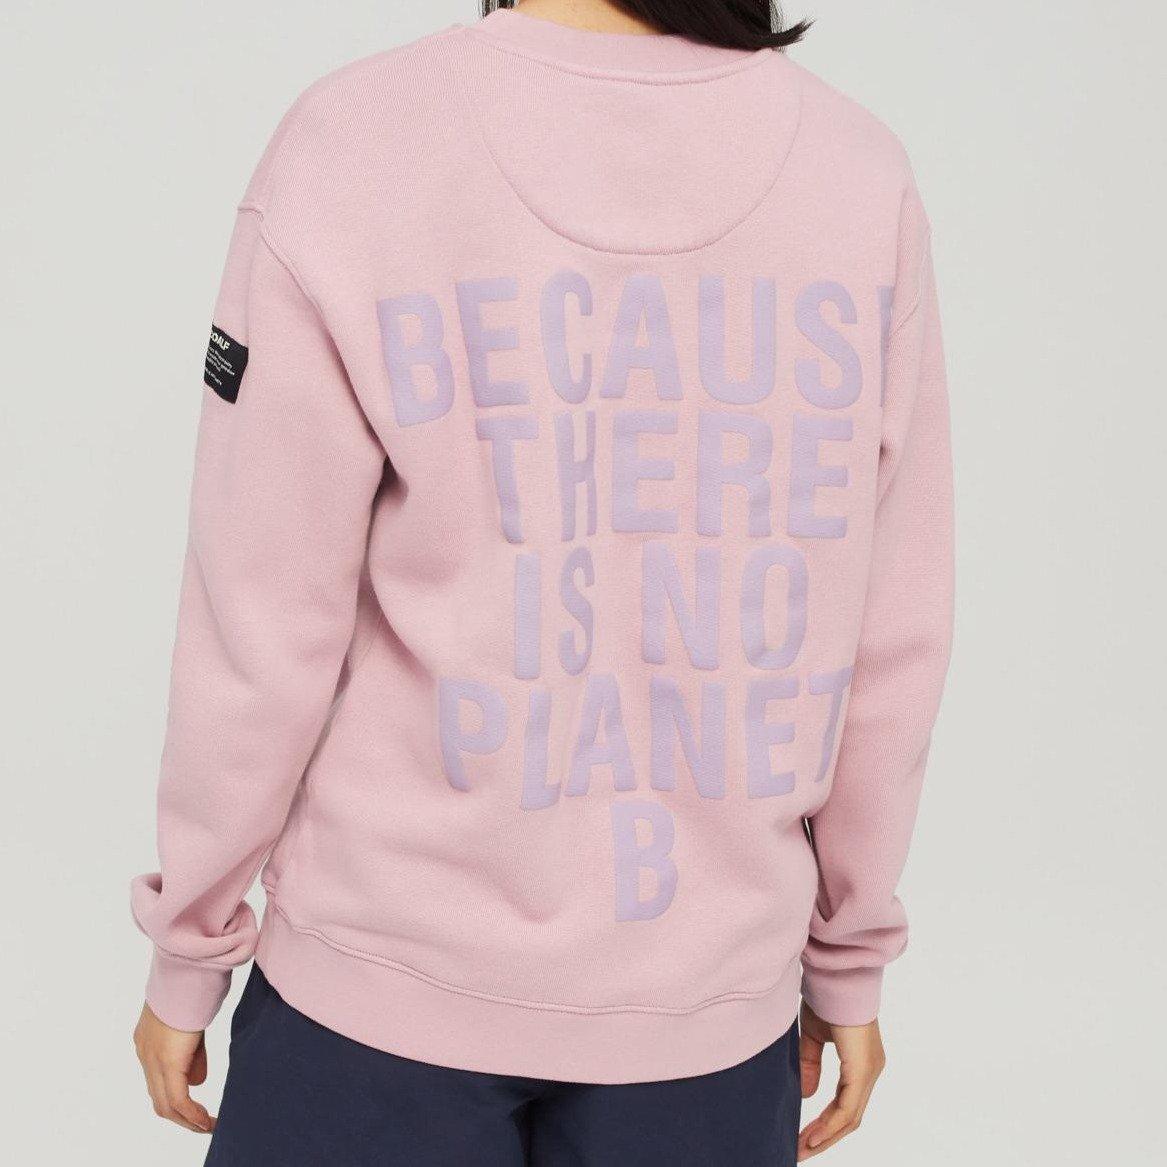 Because Sweatshirt Peppercorn